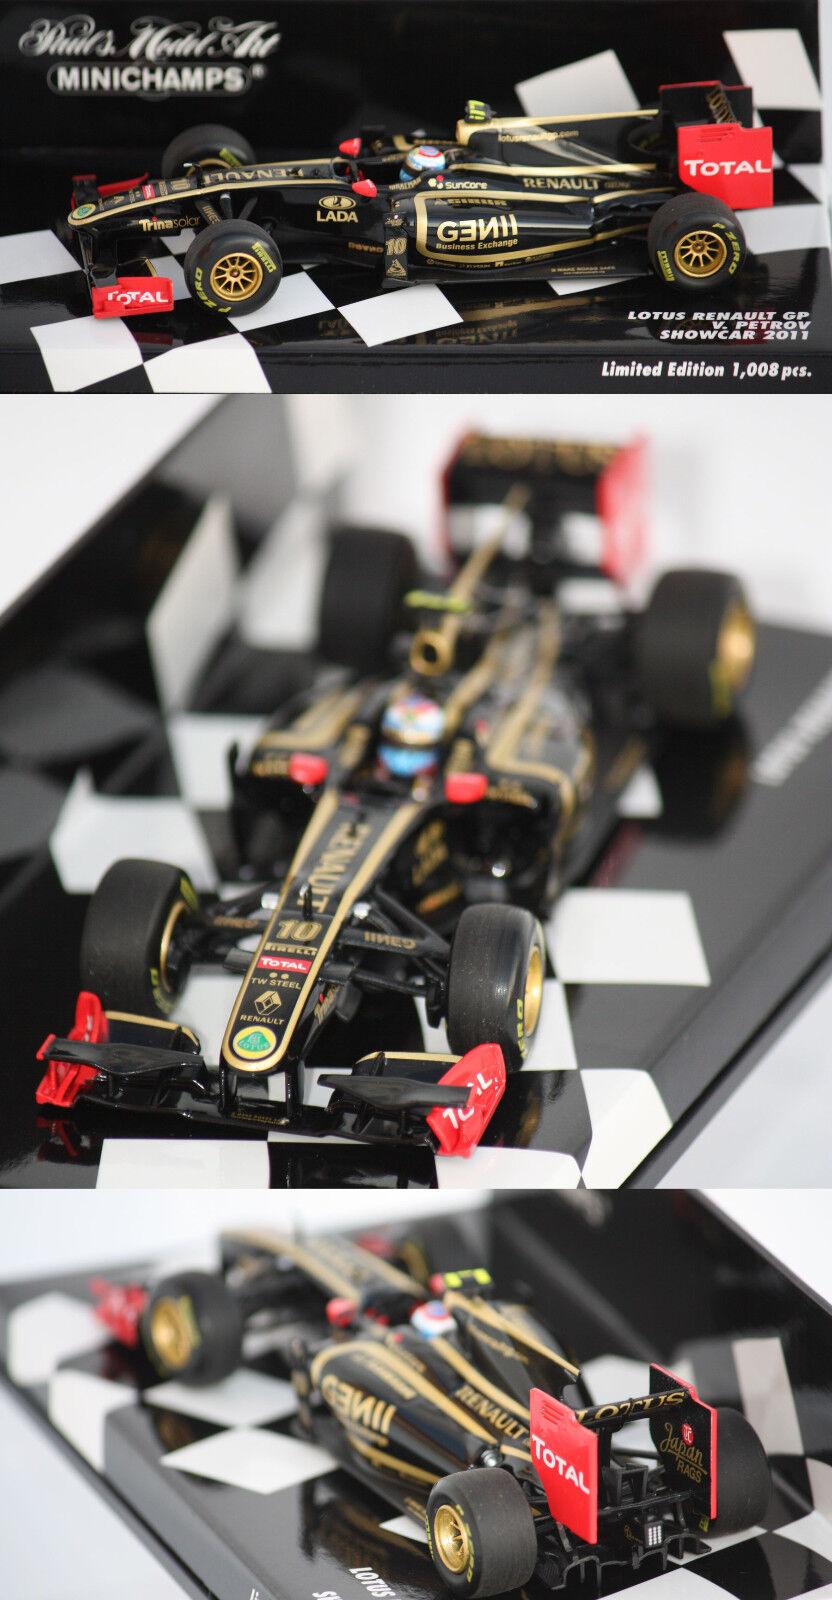 Minichamps F1 Lotus Renault Gp ShowCoche 2011V. Petrov 1 43 410110080